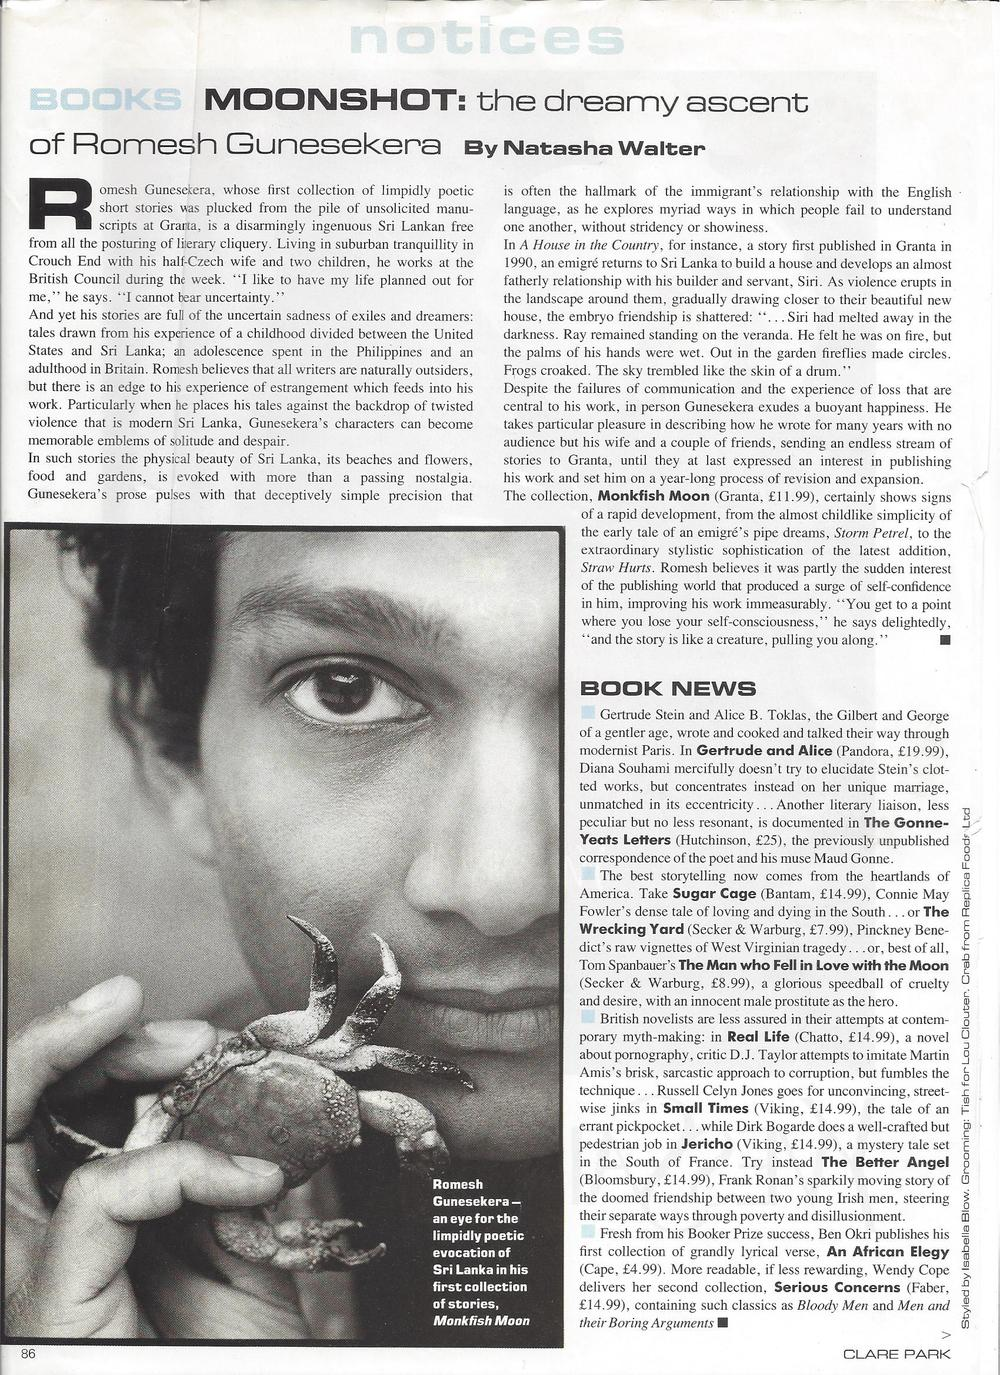 Vogue, March 1992